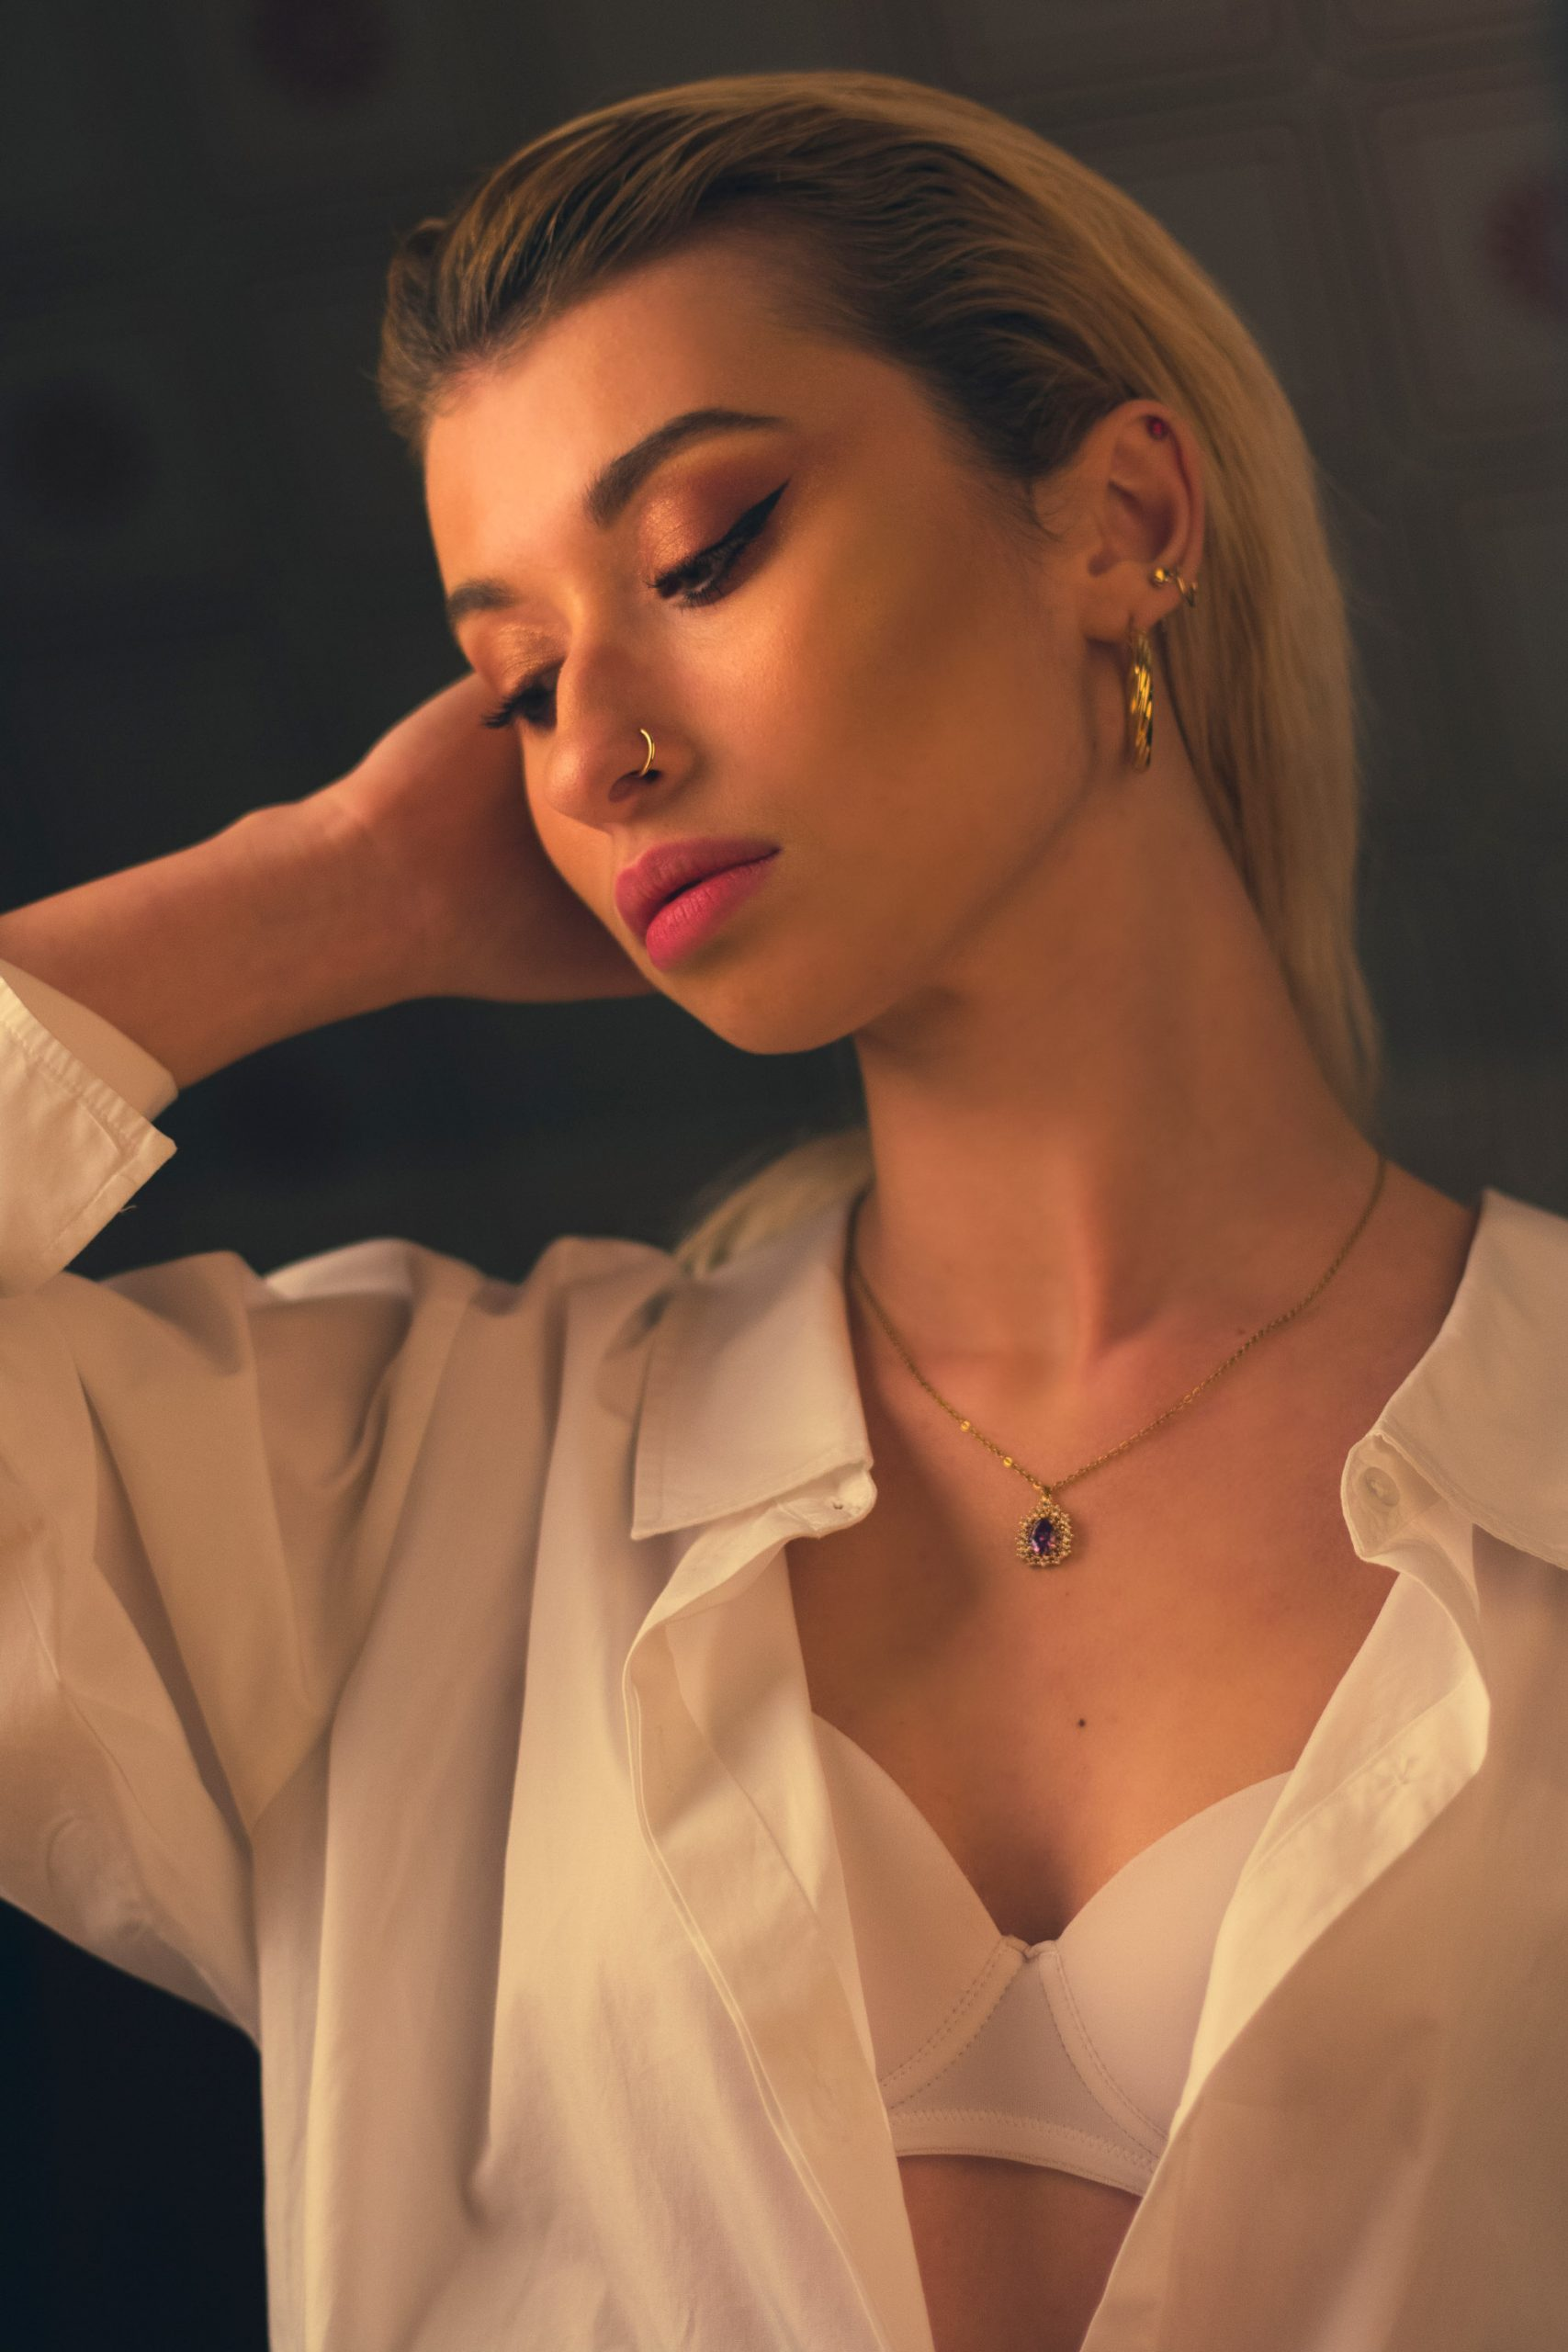 Categorie: Glamour, Fashion, Portrait - Photographer: FEDERICO ESPOSITO - Model: VALENTINA CARLEI - Location: Lamezia Terme, CZ, Italia